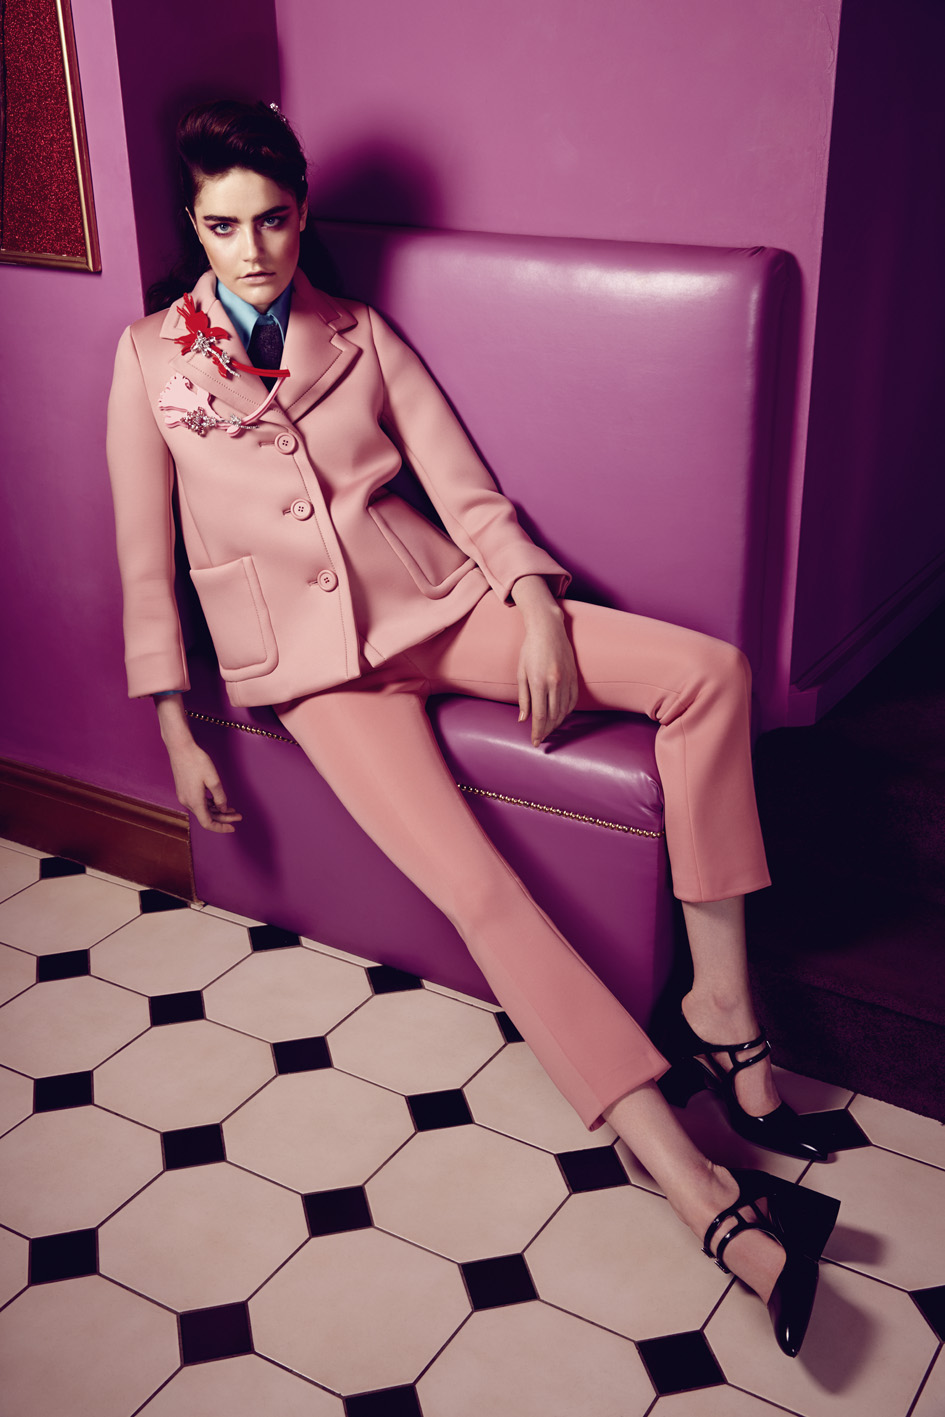 julia_kennedy_daphne_velghe_pink_house_01.jpg